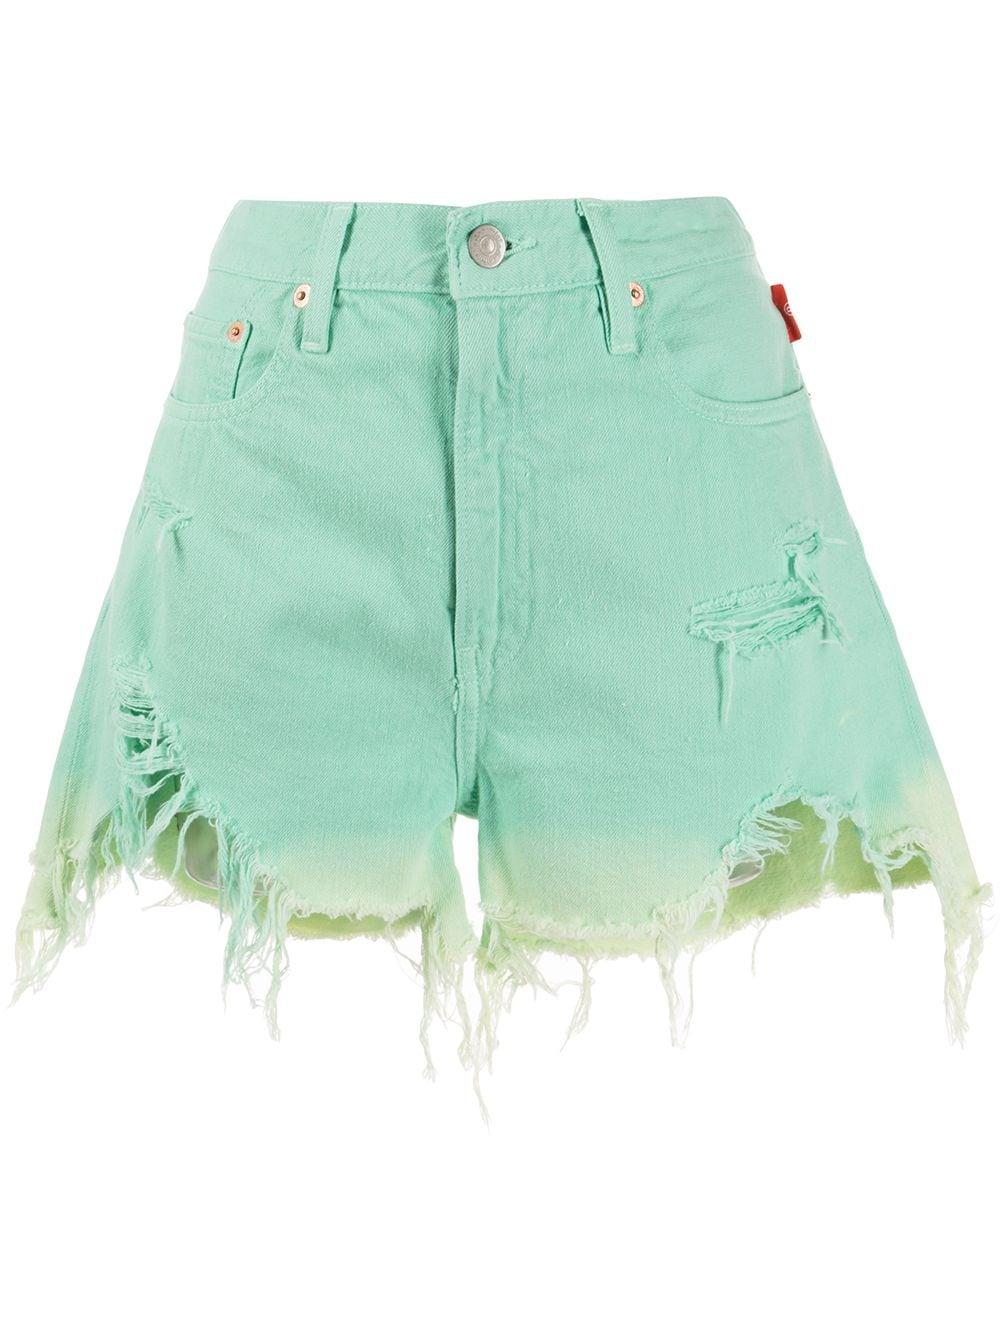 Nic Distressed Hem Cutoff Shorts Item # DSW2200-213